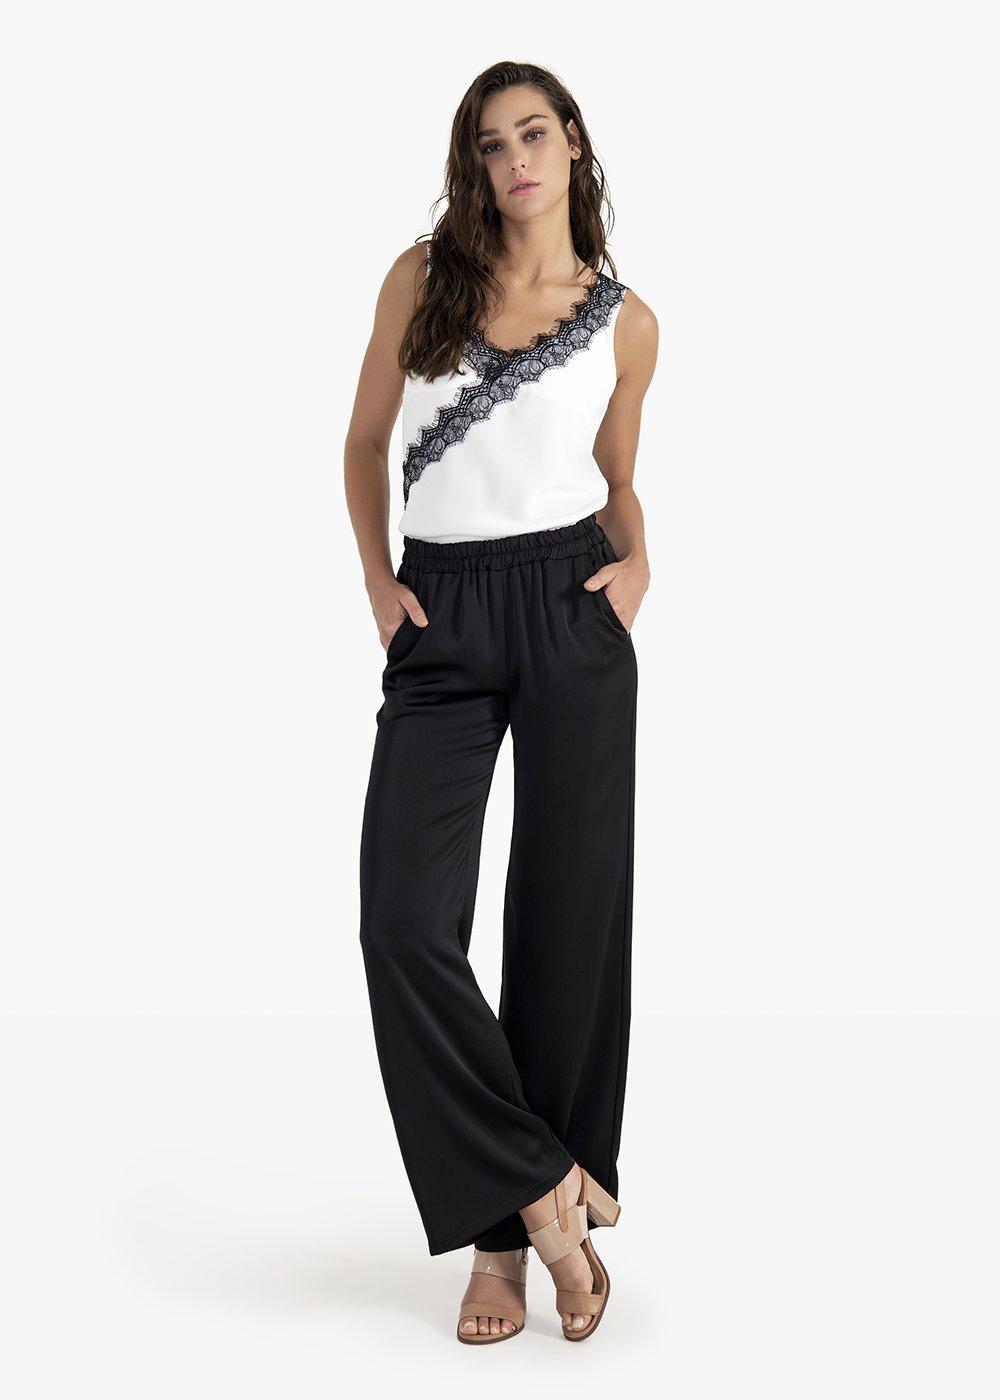 Pantaloni Pedro a palazzo in tessuto satin - Black - Donna